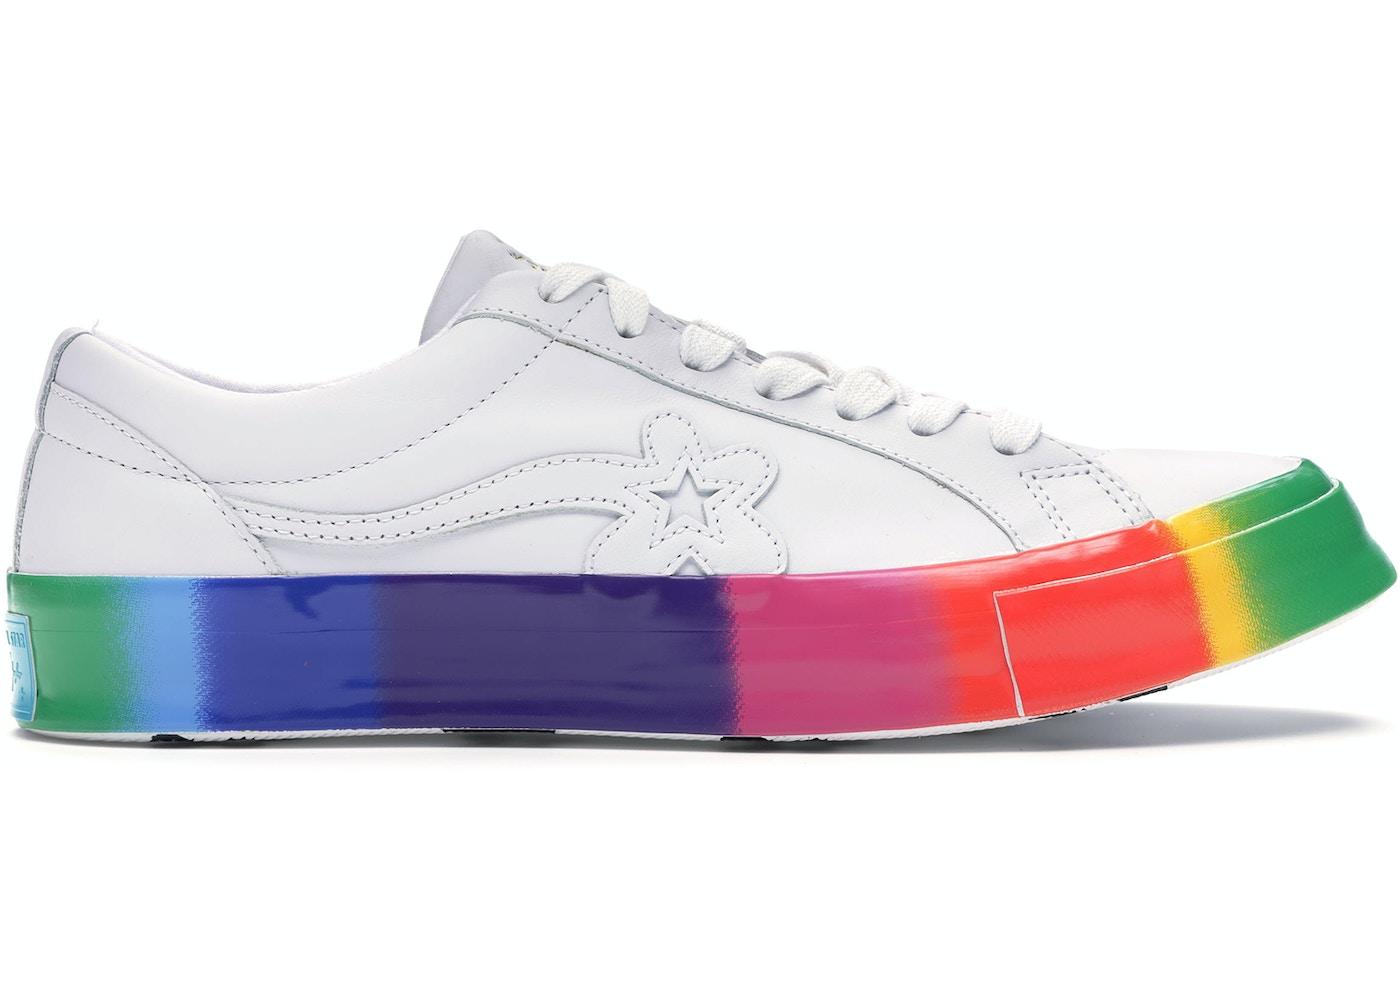 Converse One Star Ox Golf Le Fleur Rainbow Sole 166409c